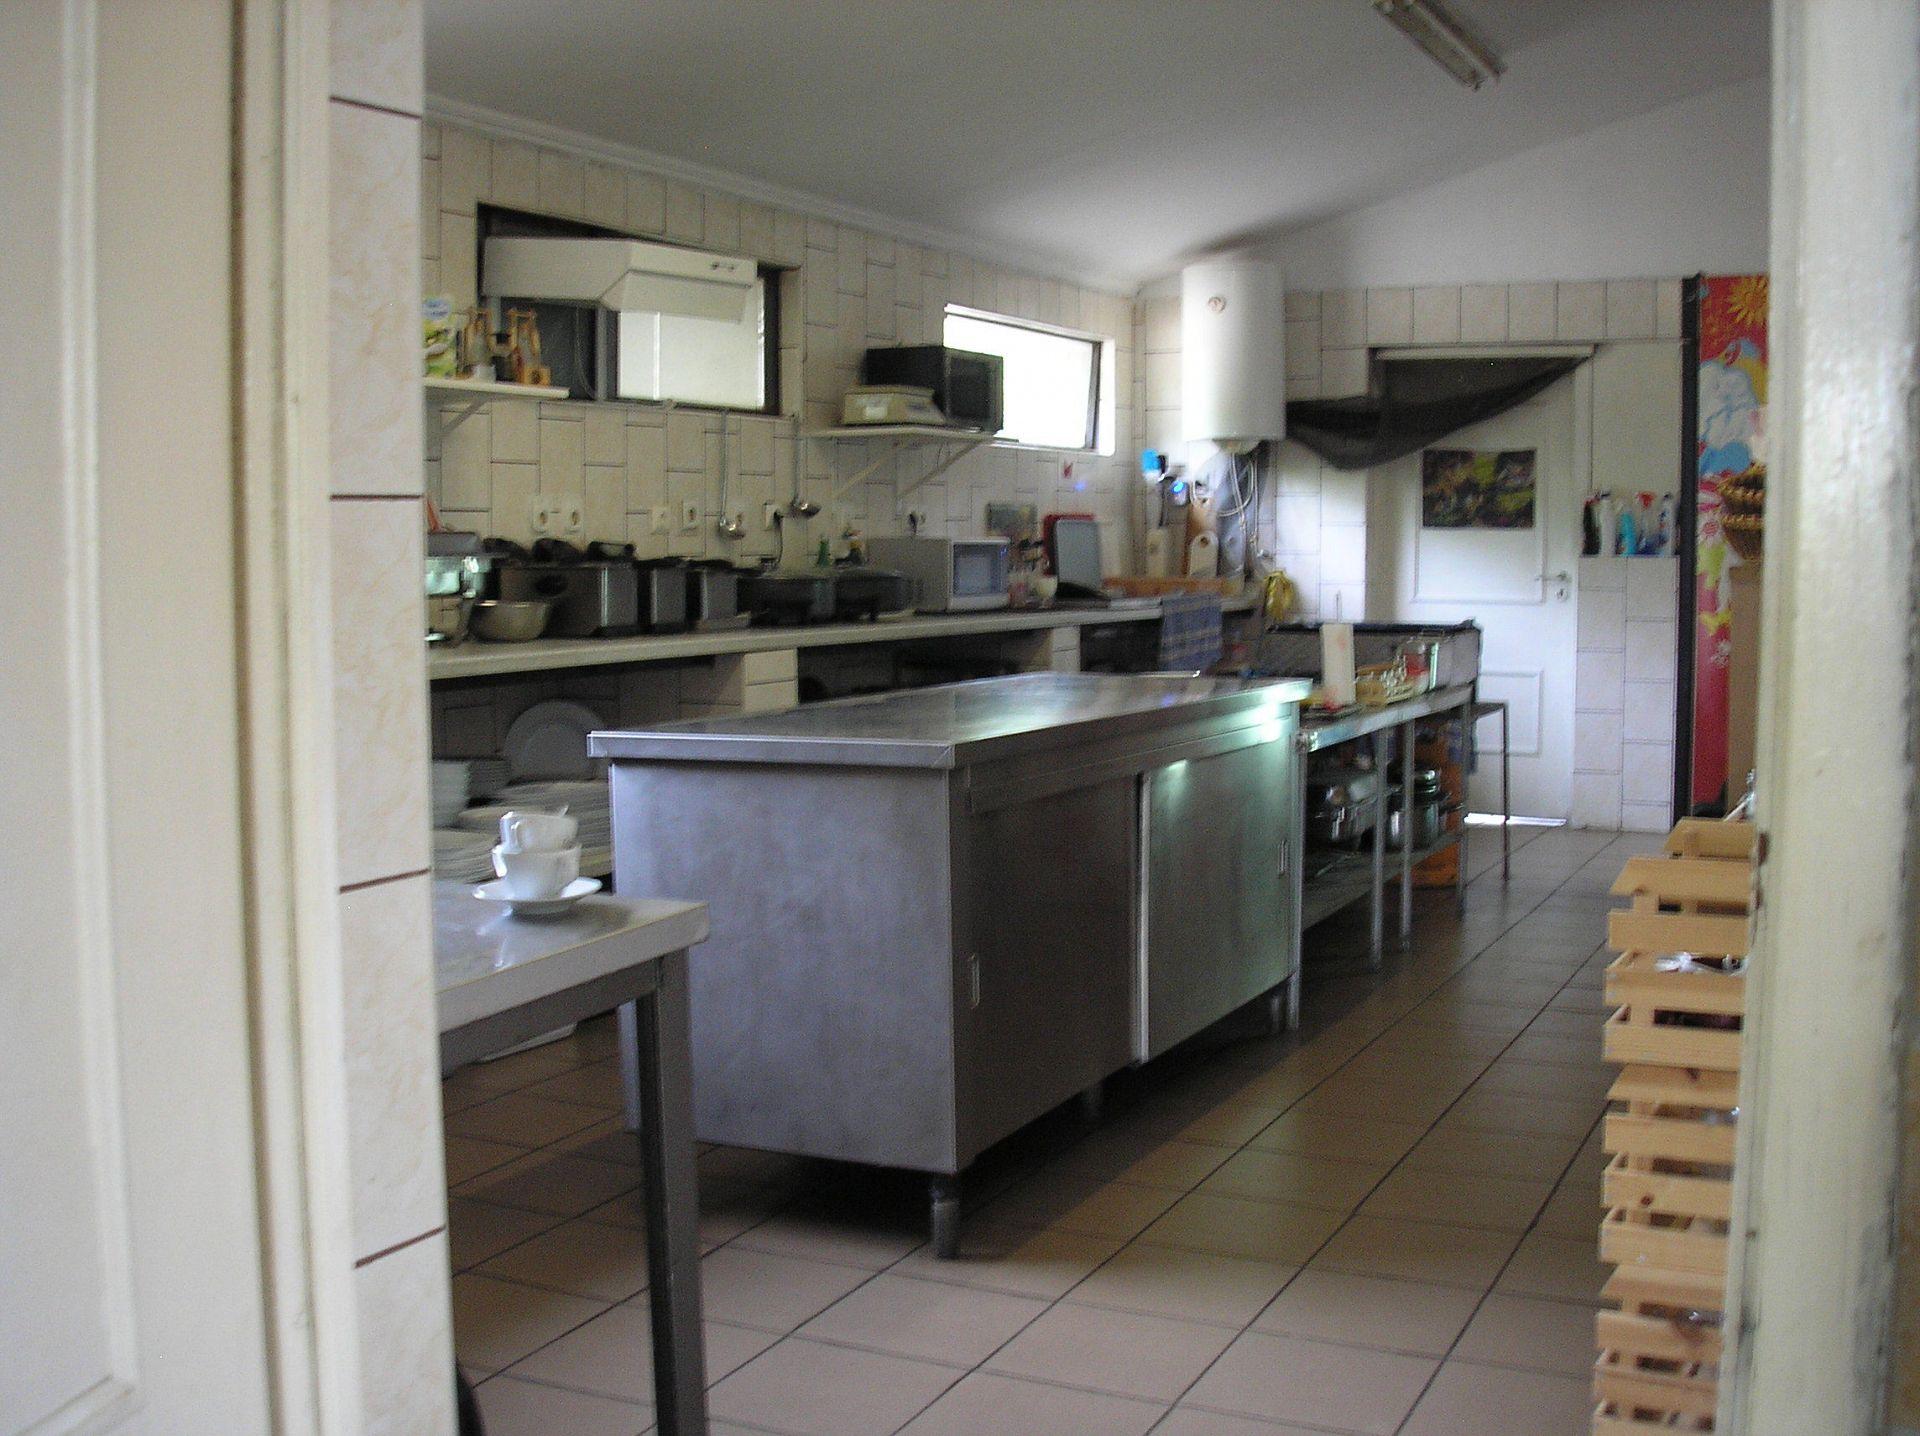 Zvonkic - Aljmas - Ferienwohnungen Kroatien - Restaurant